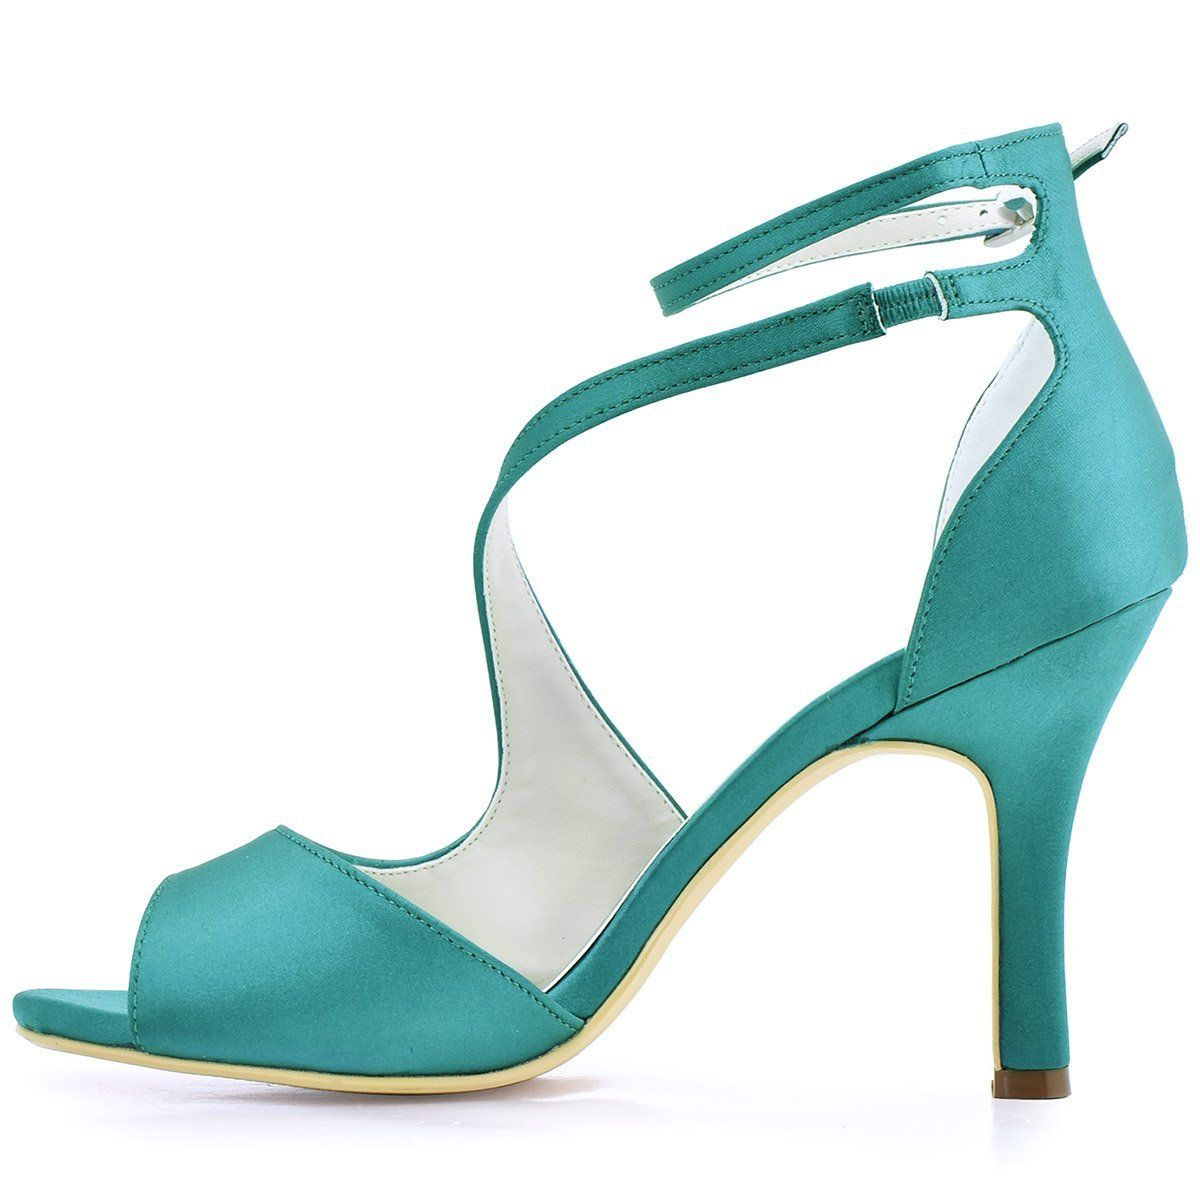 8f0b8f9544974 Amazon.com   ElegantPark Women's Peep Toe High Heels Ankle Straps ...